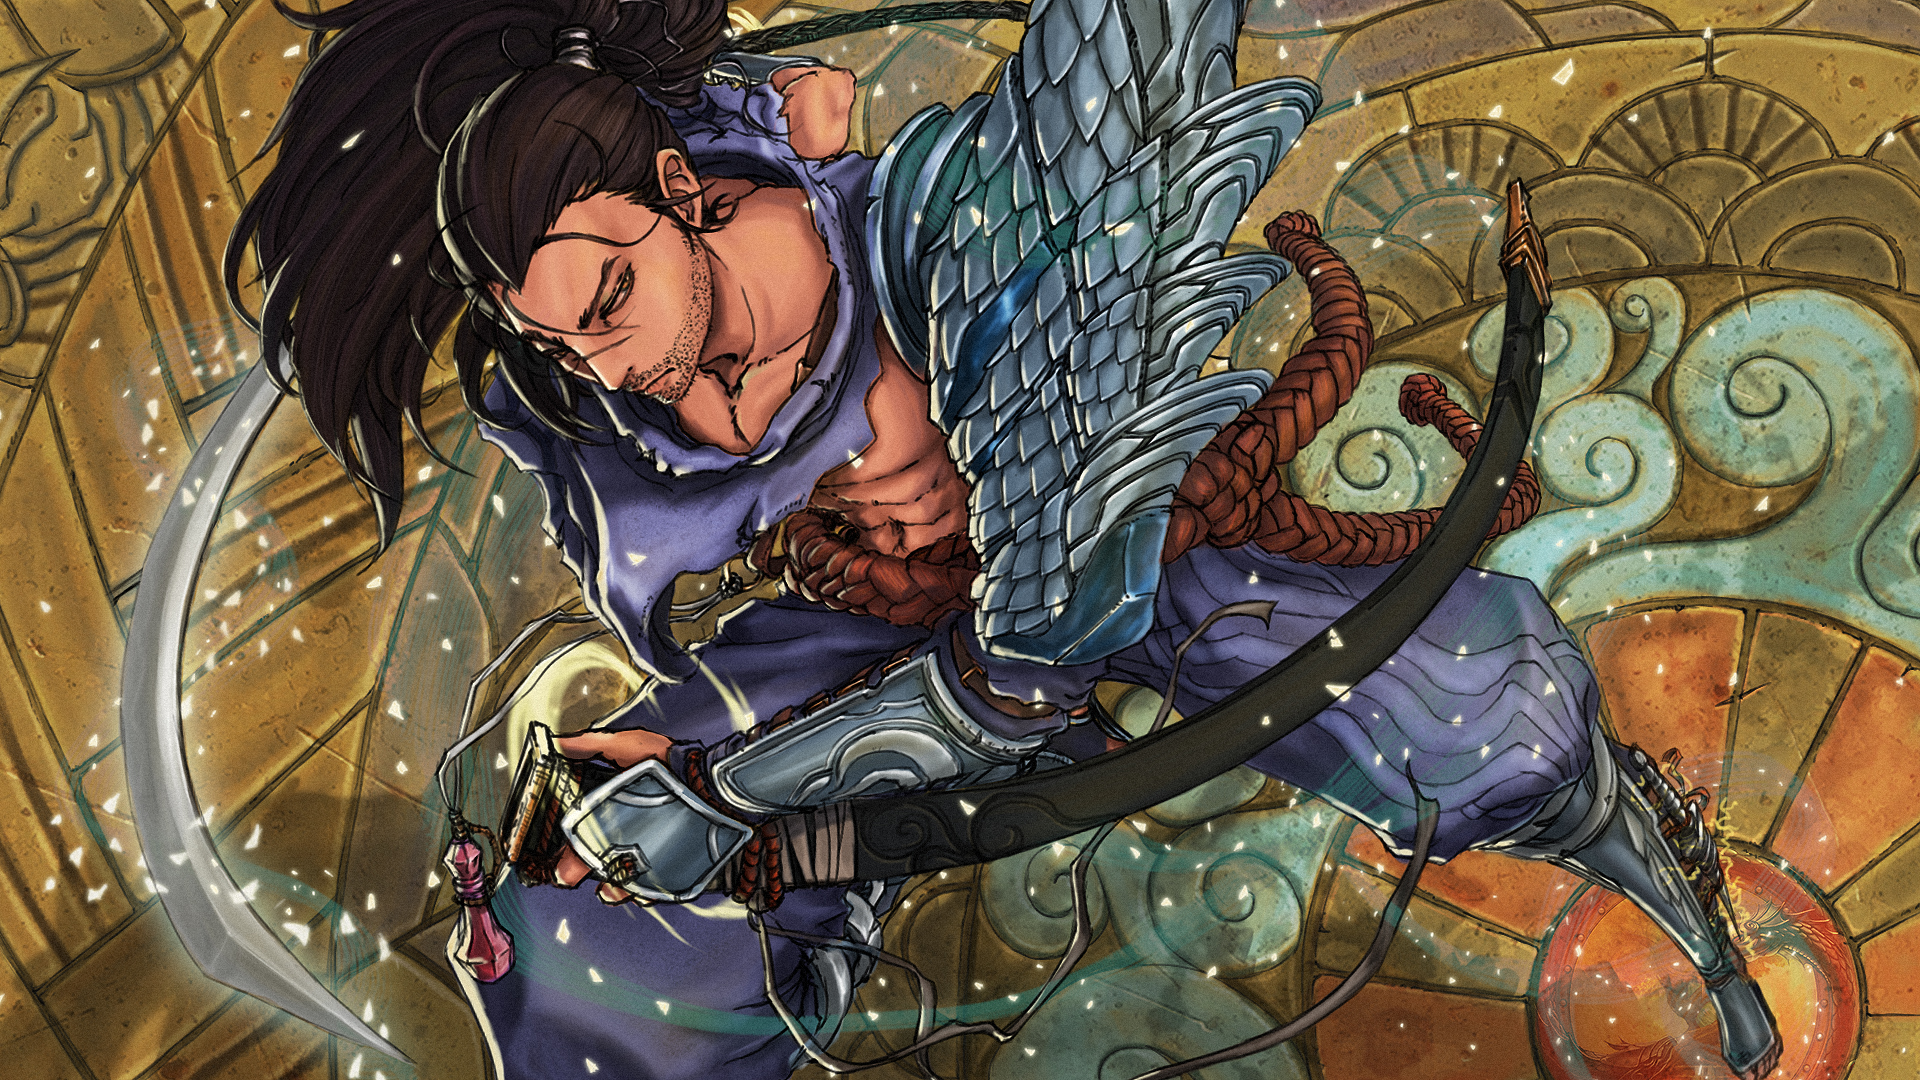 League of Legends Yasuo fanart by kumagzter